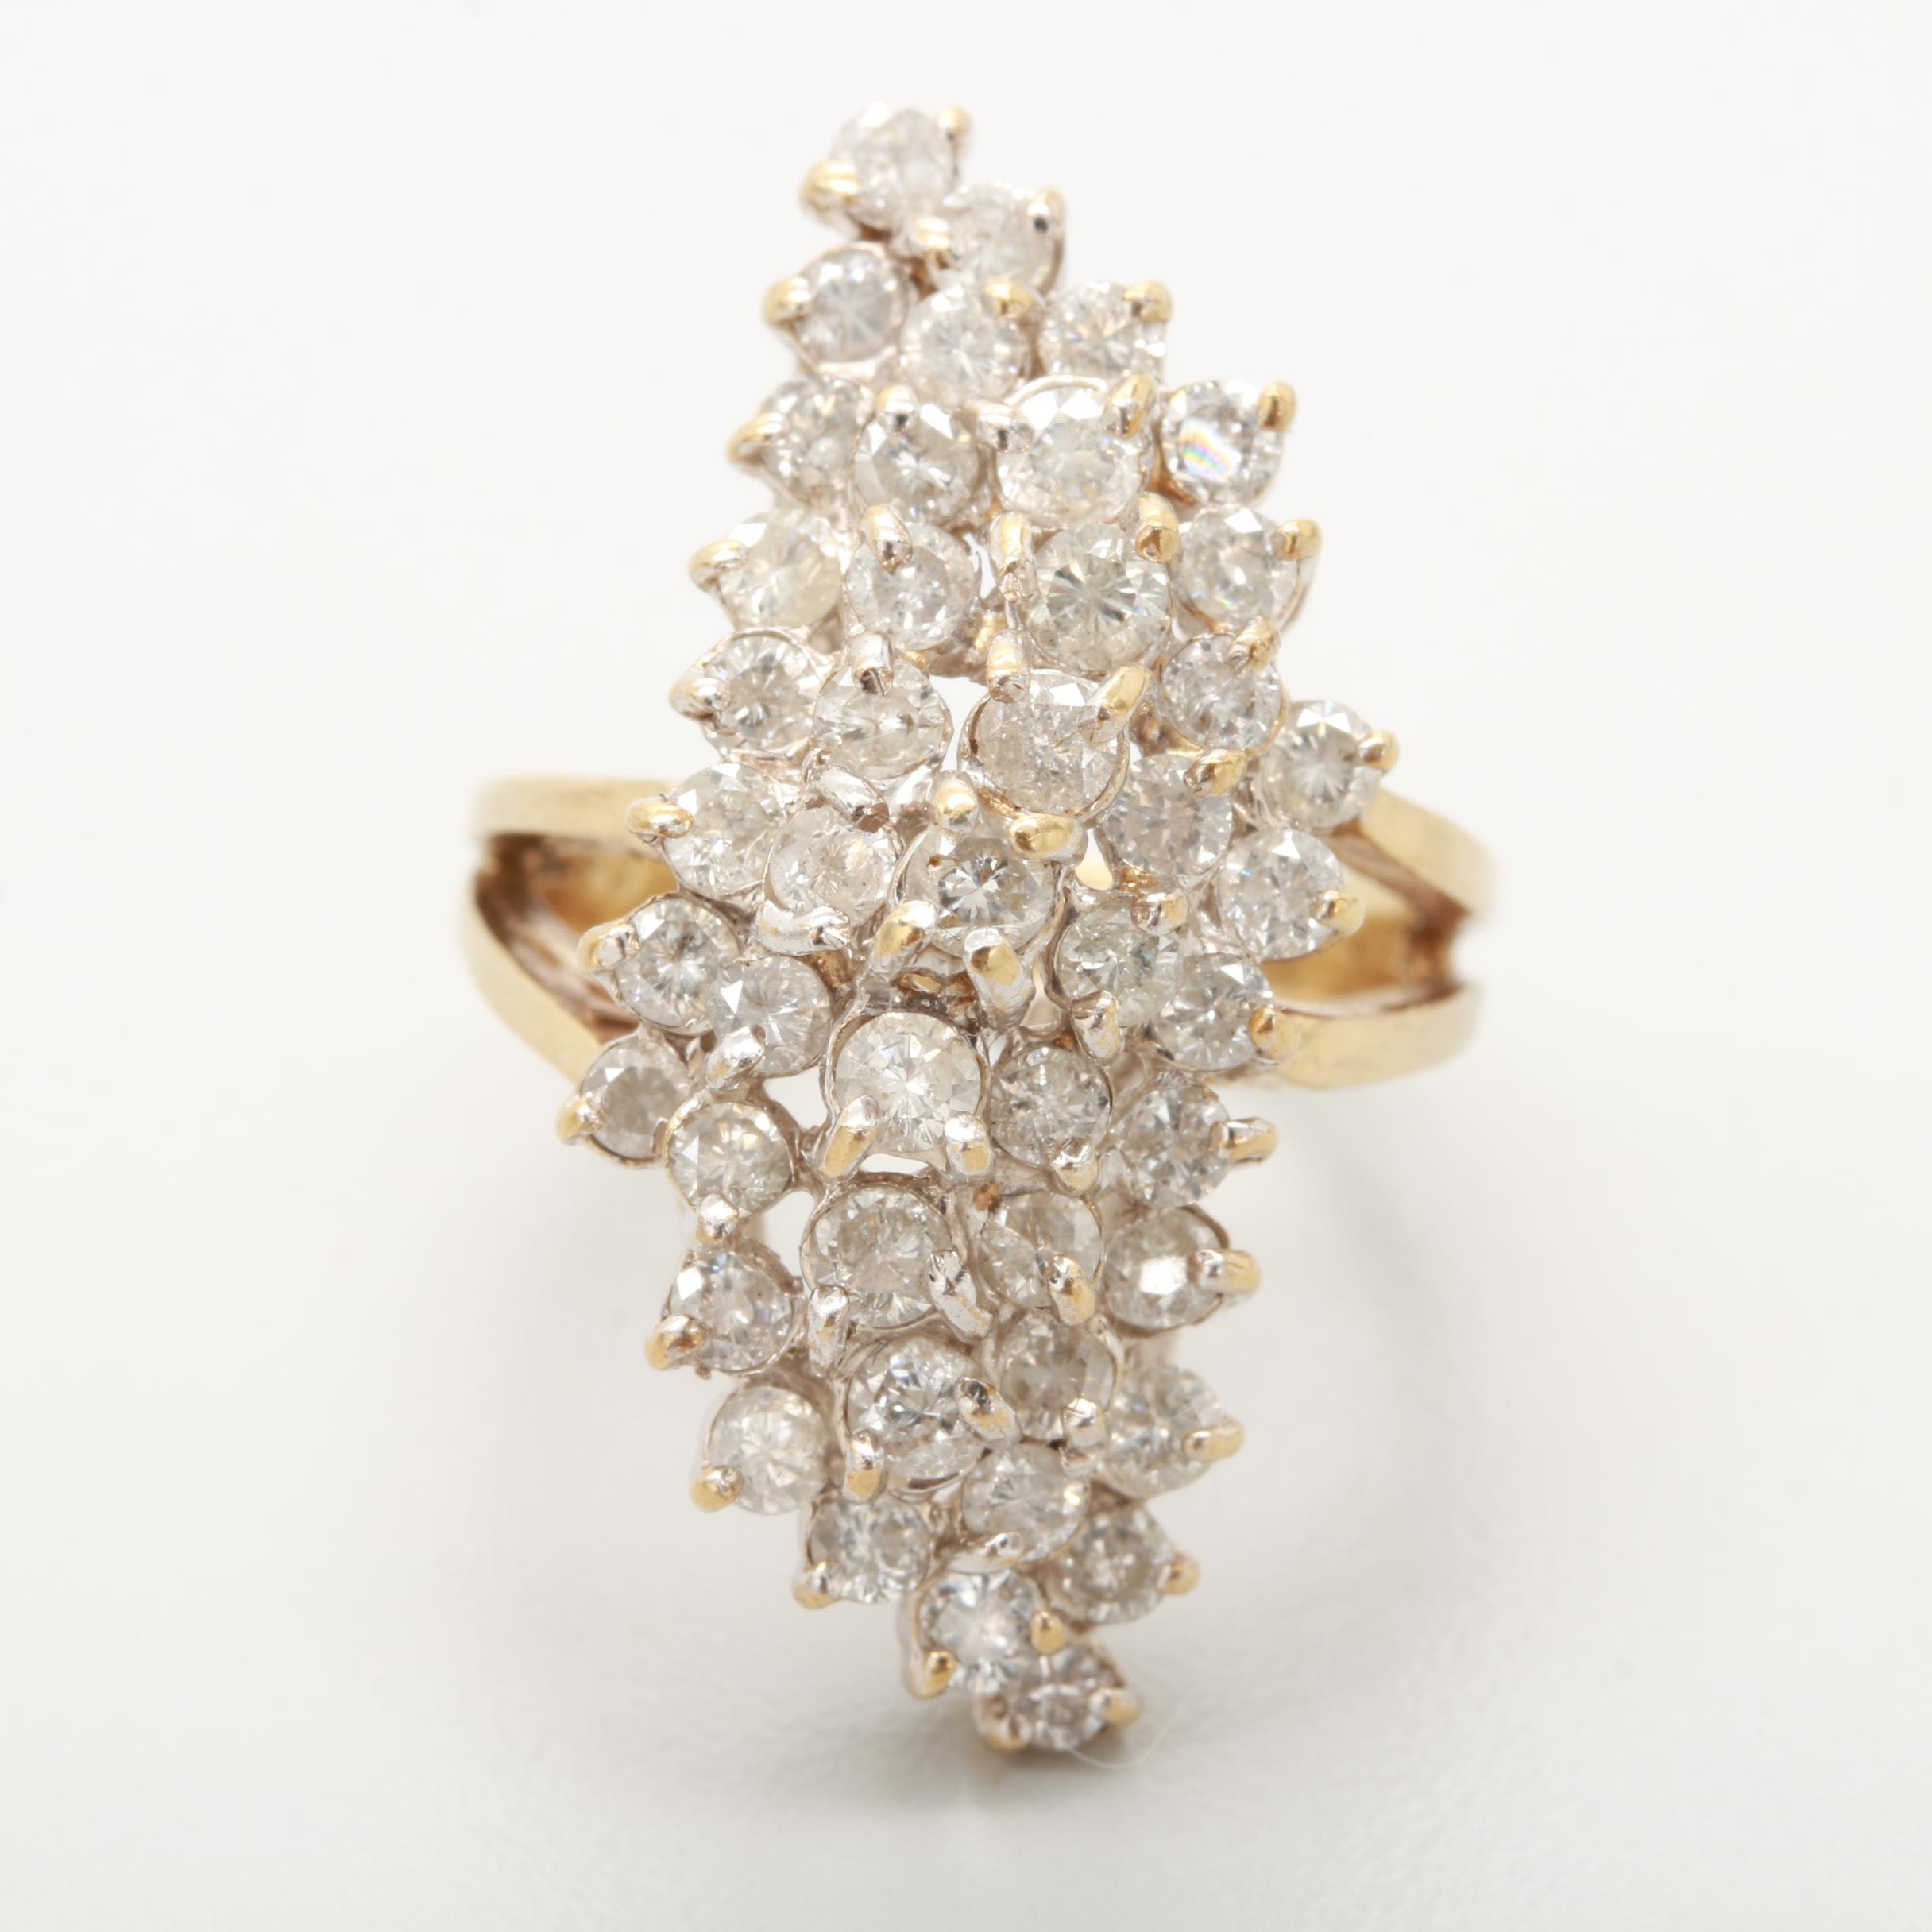 10K Yellow Gold 3.00 CTW Diamond Navette Ring